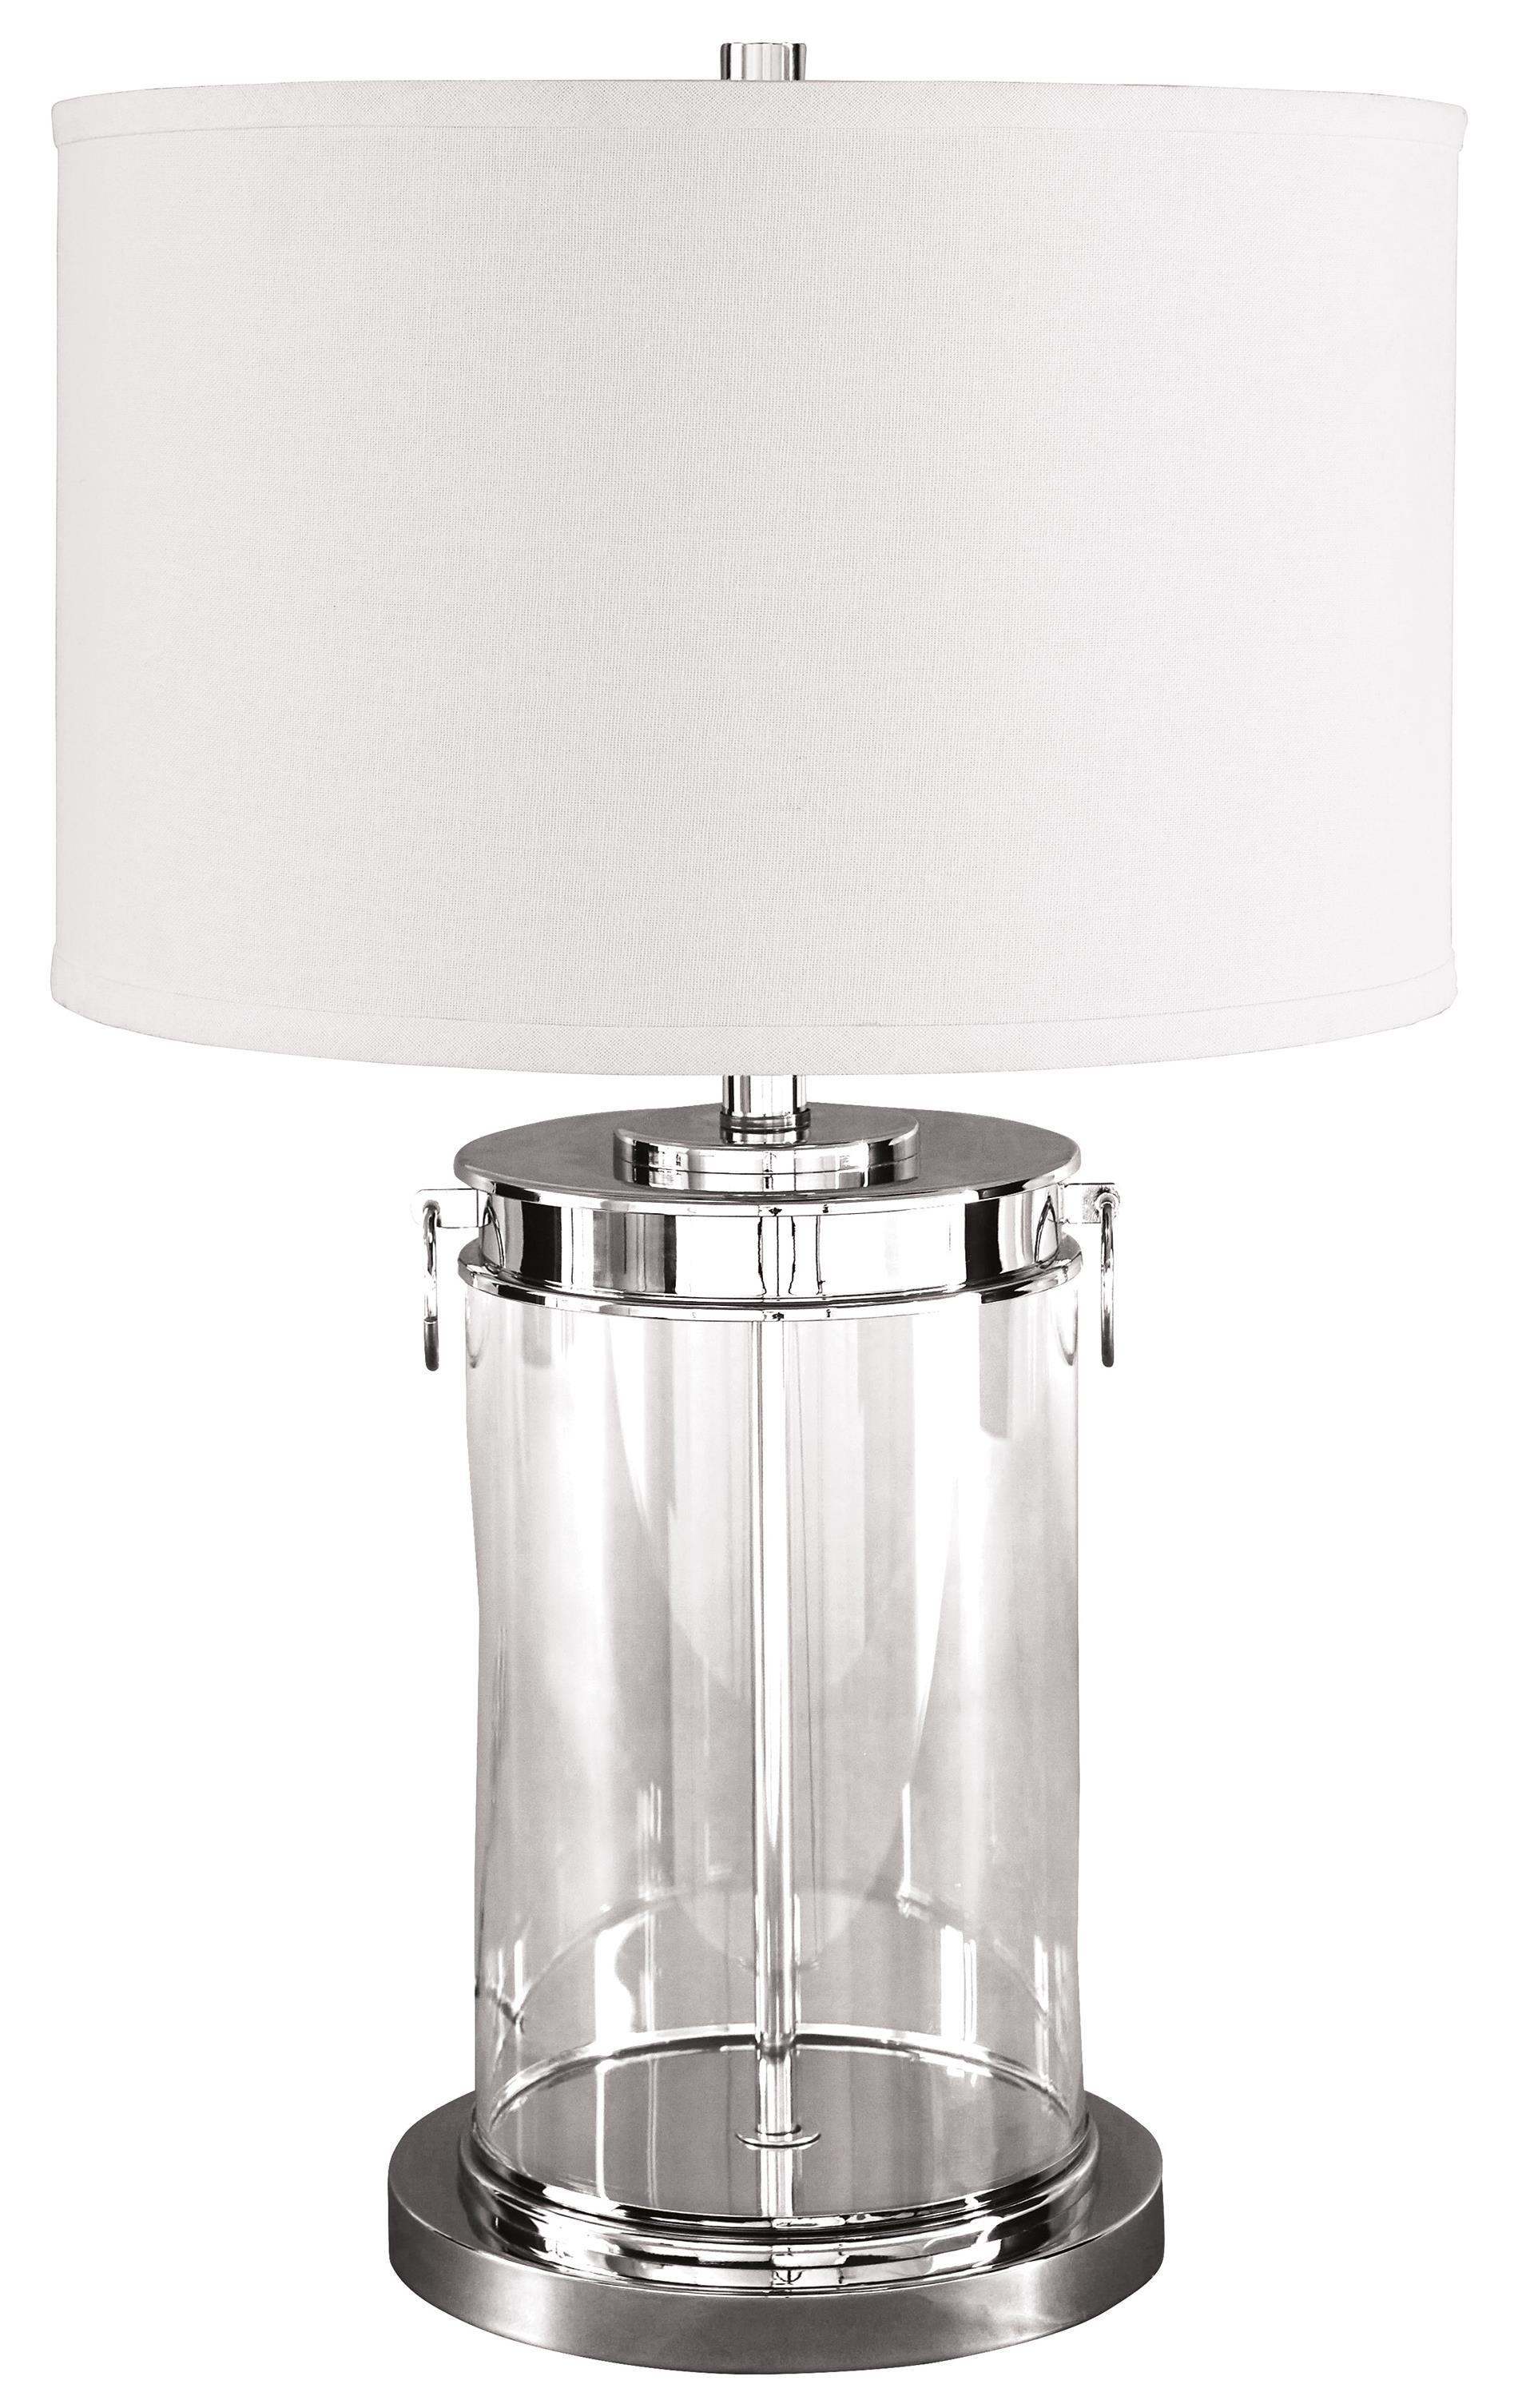 Tailynn Glass Table Lamp